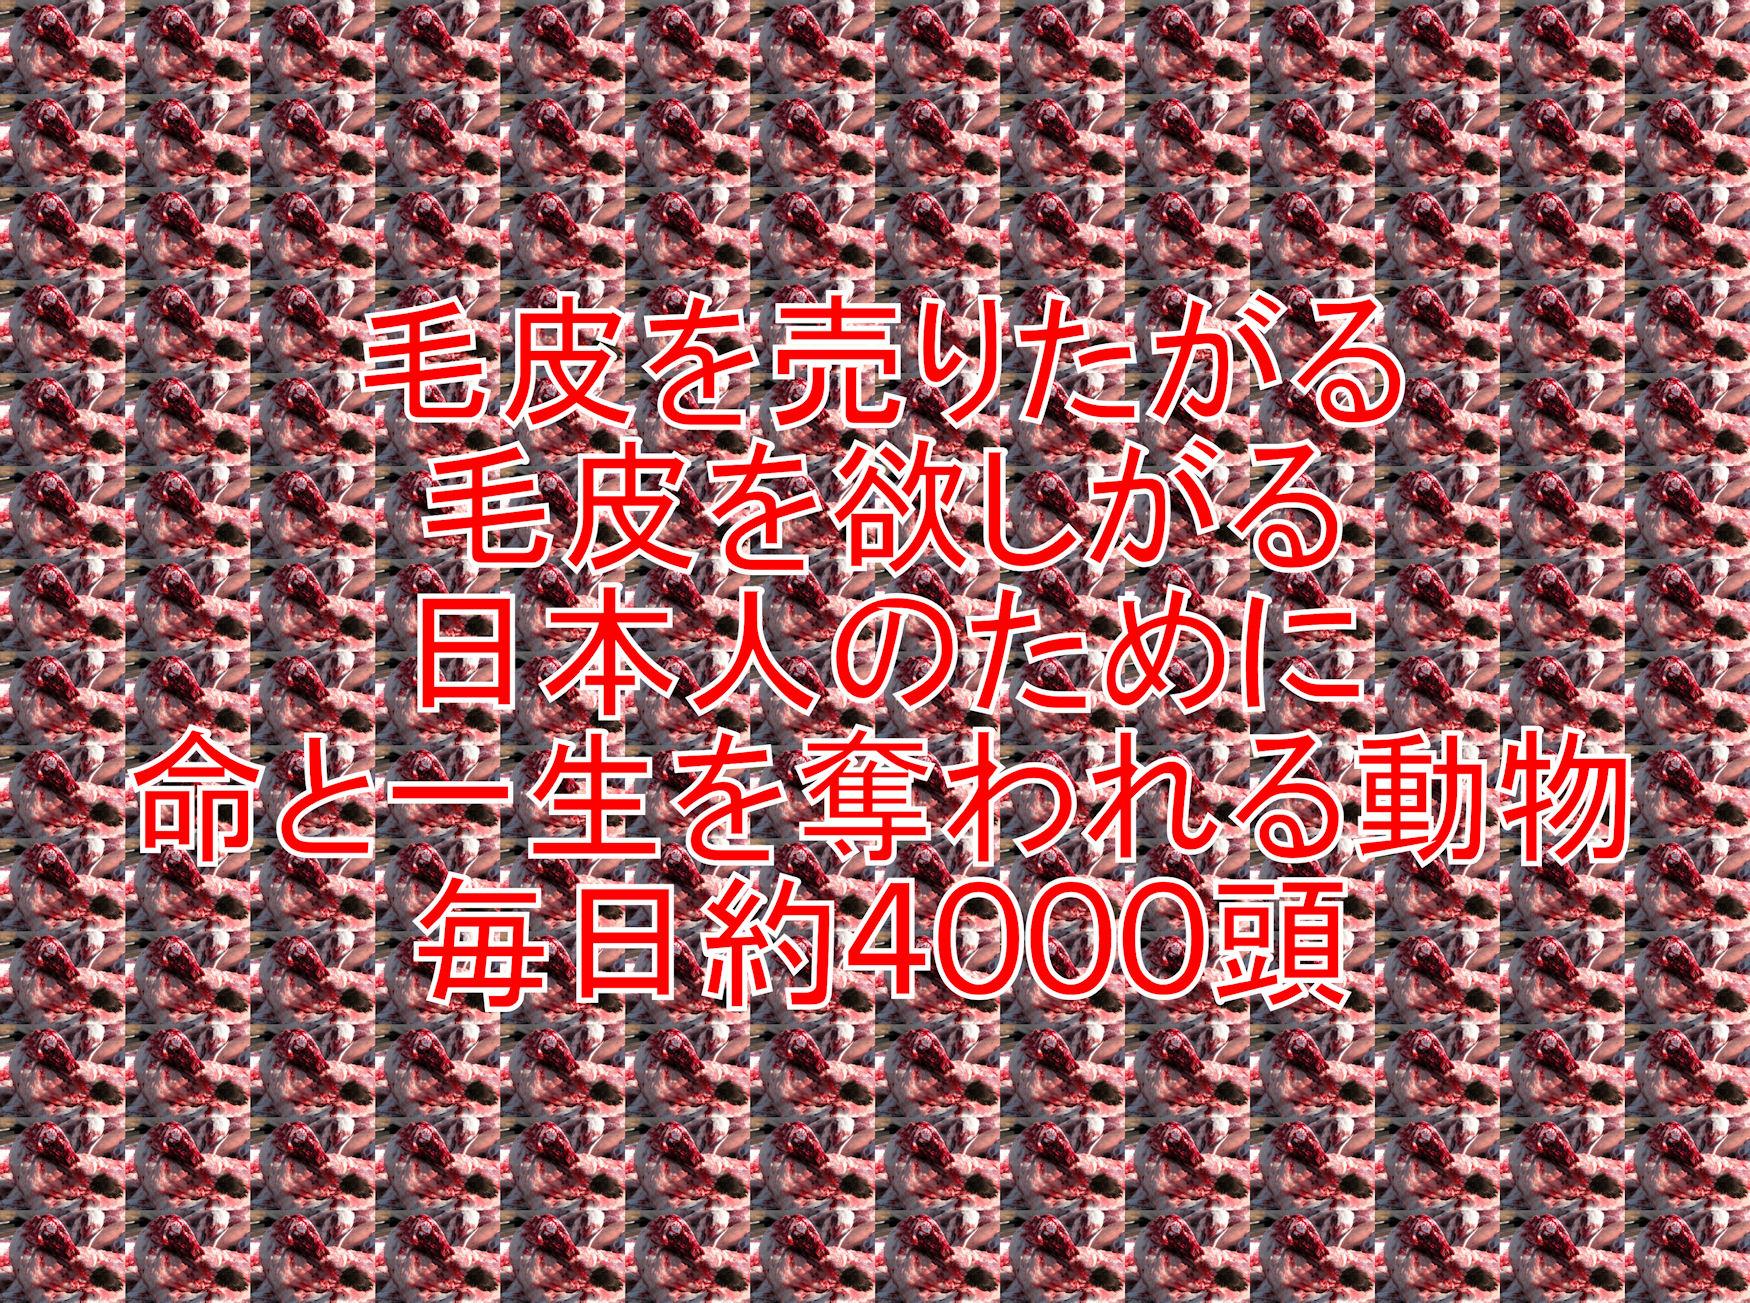 kegawas2_201308220053586f6.jpg